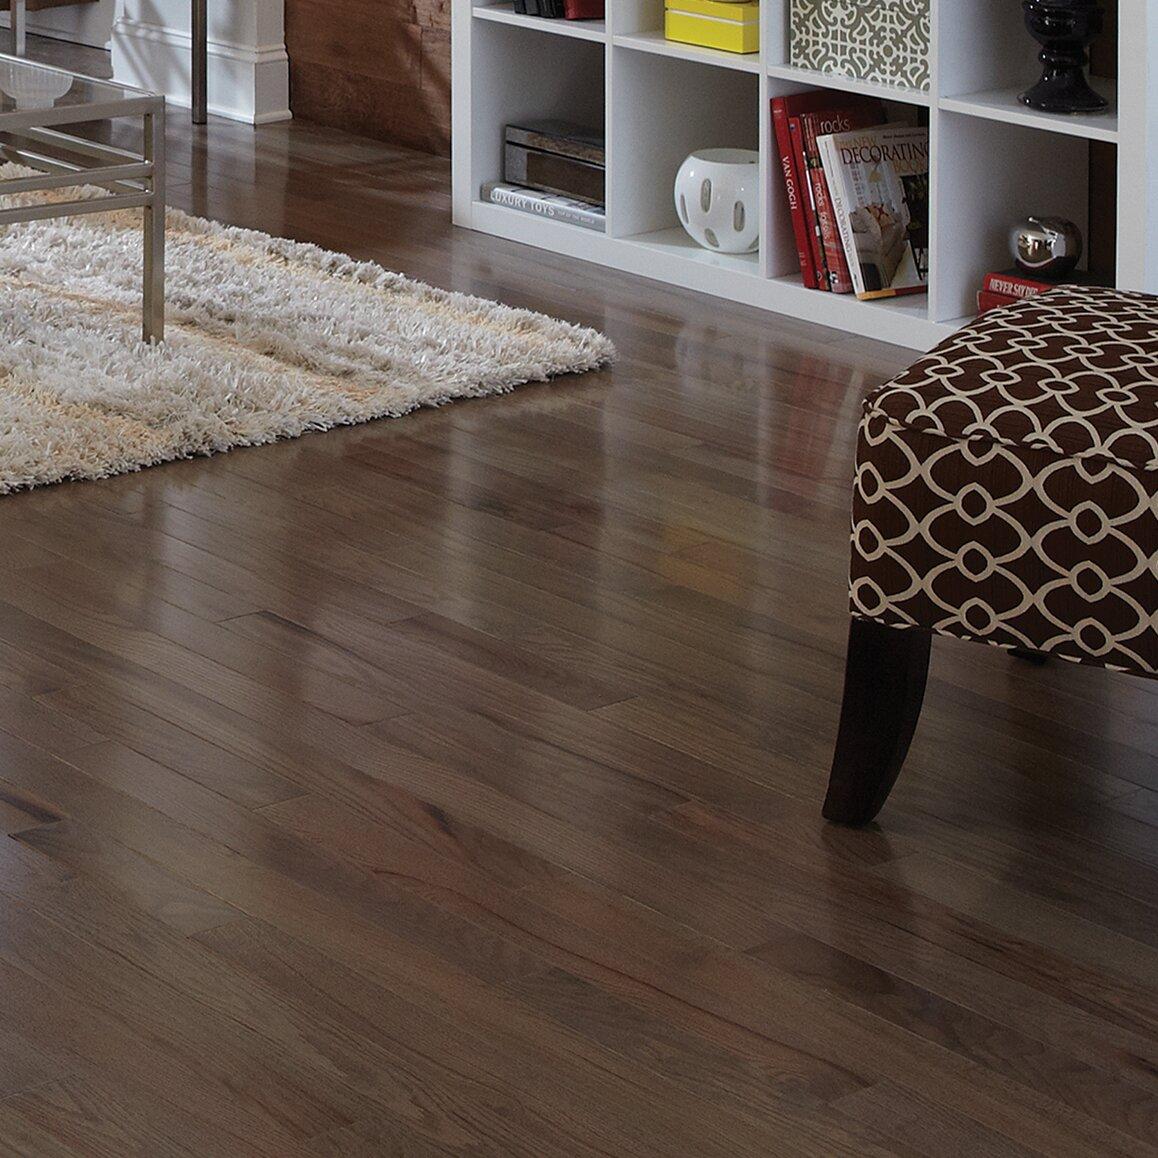 "Somerset Color Strip 2-1/4"" Solid White Oak Hardwood Flooring in Smoke ..."